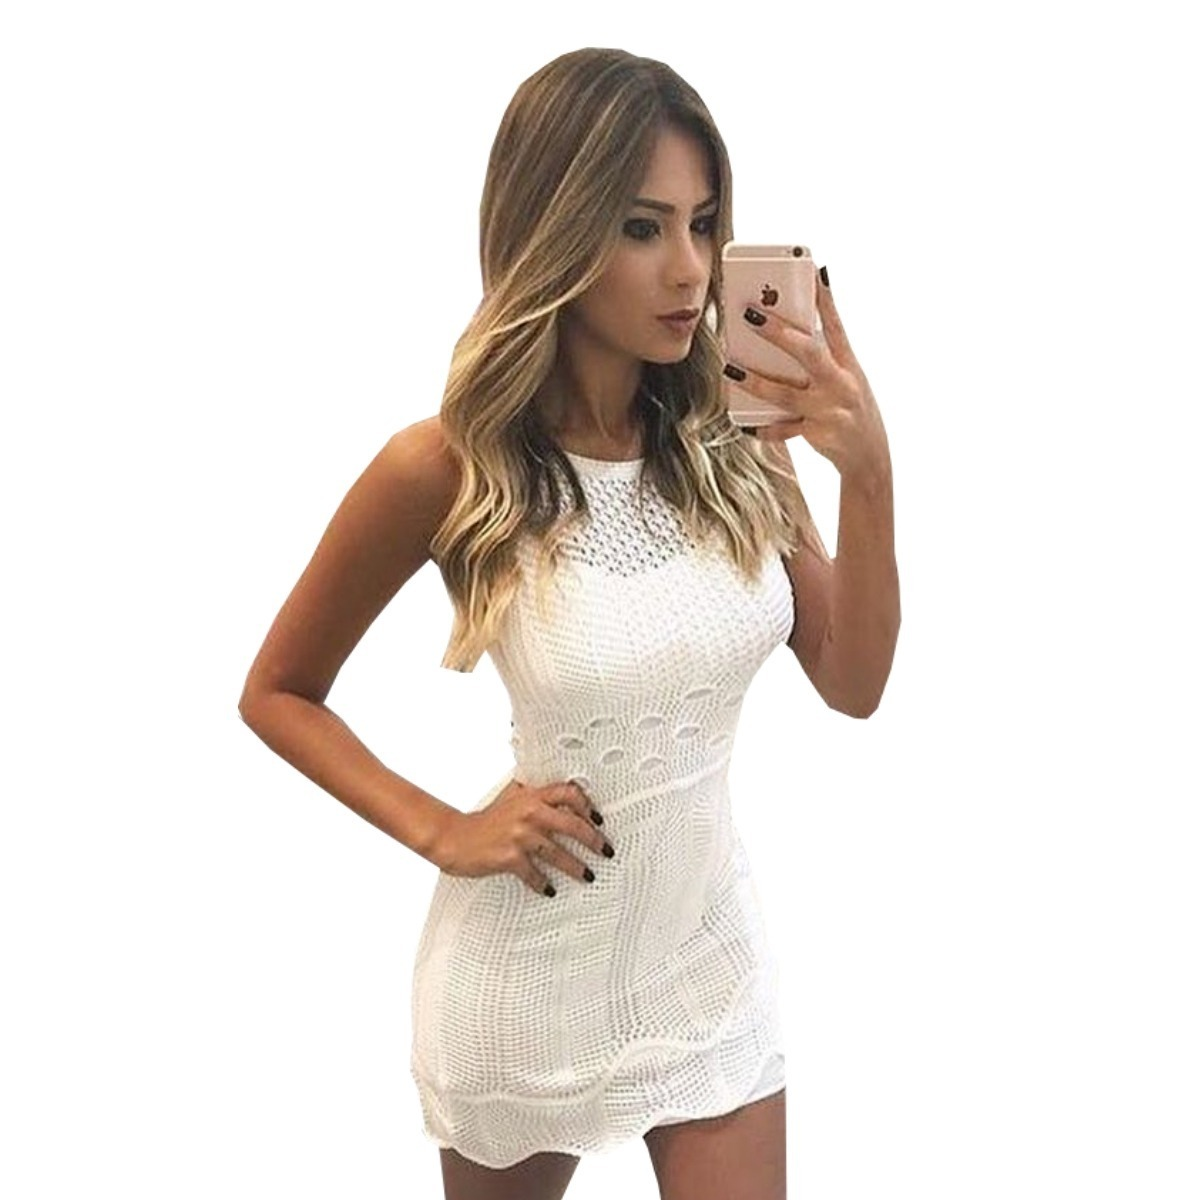 de432cc087 vestido branco curto da moda tricot trico roupas femininas. Carregando zoom.